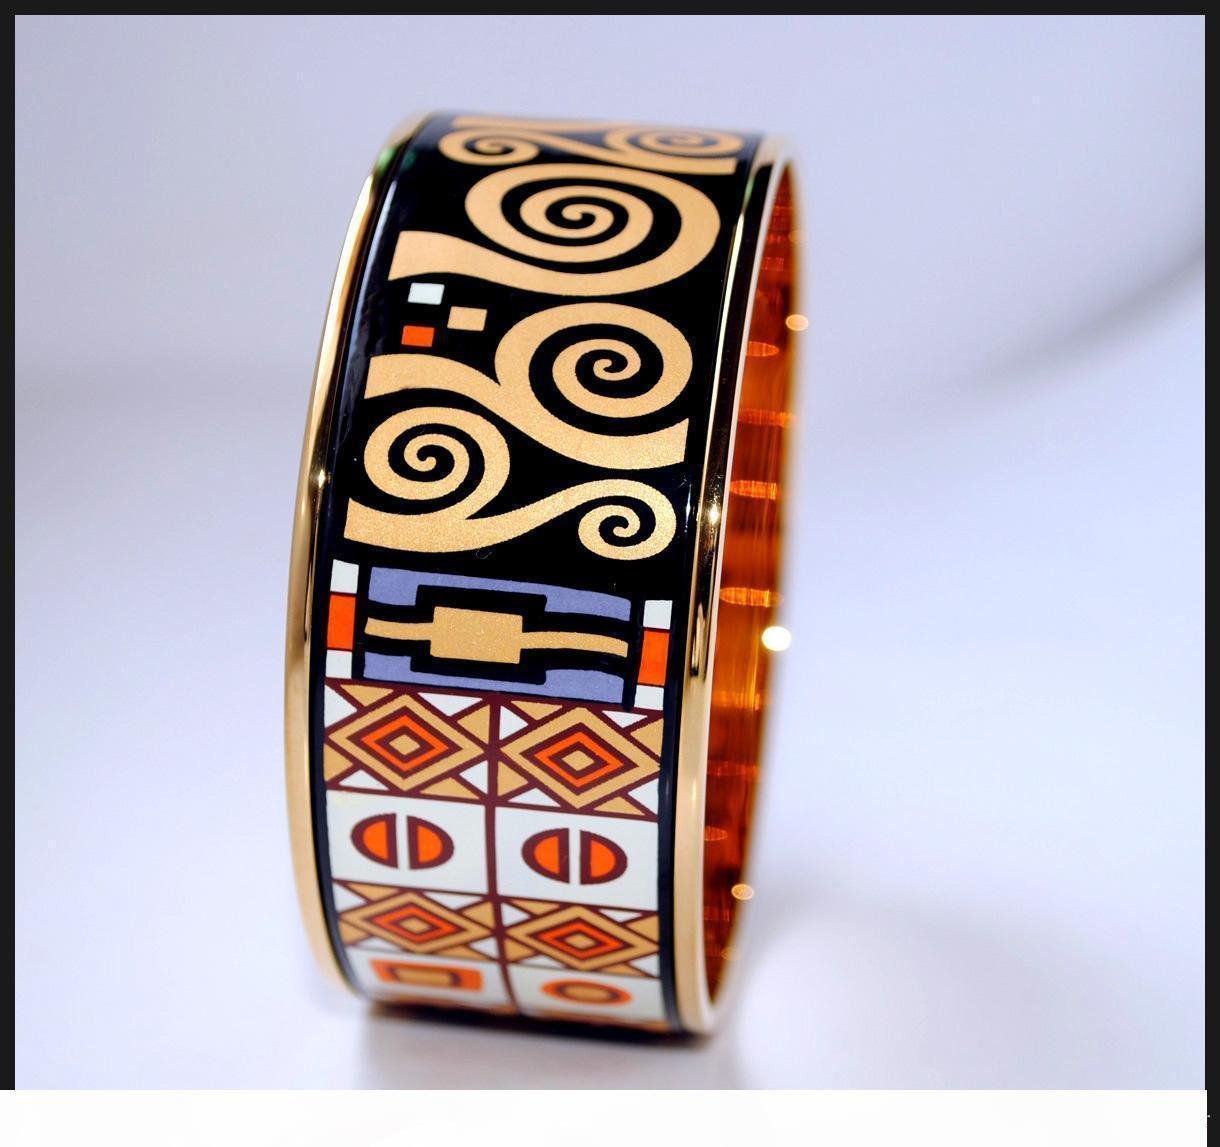 Klimt Series banhado a ouro 18K esmalte pulseira de pulseiras mulher de qualidade Top pulseiras largura acessórios 30 milímetros de jóias Moda